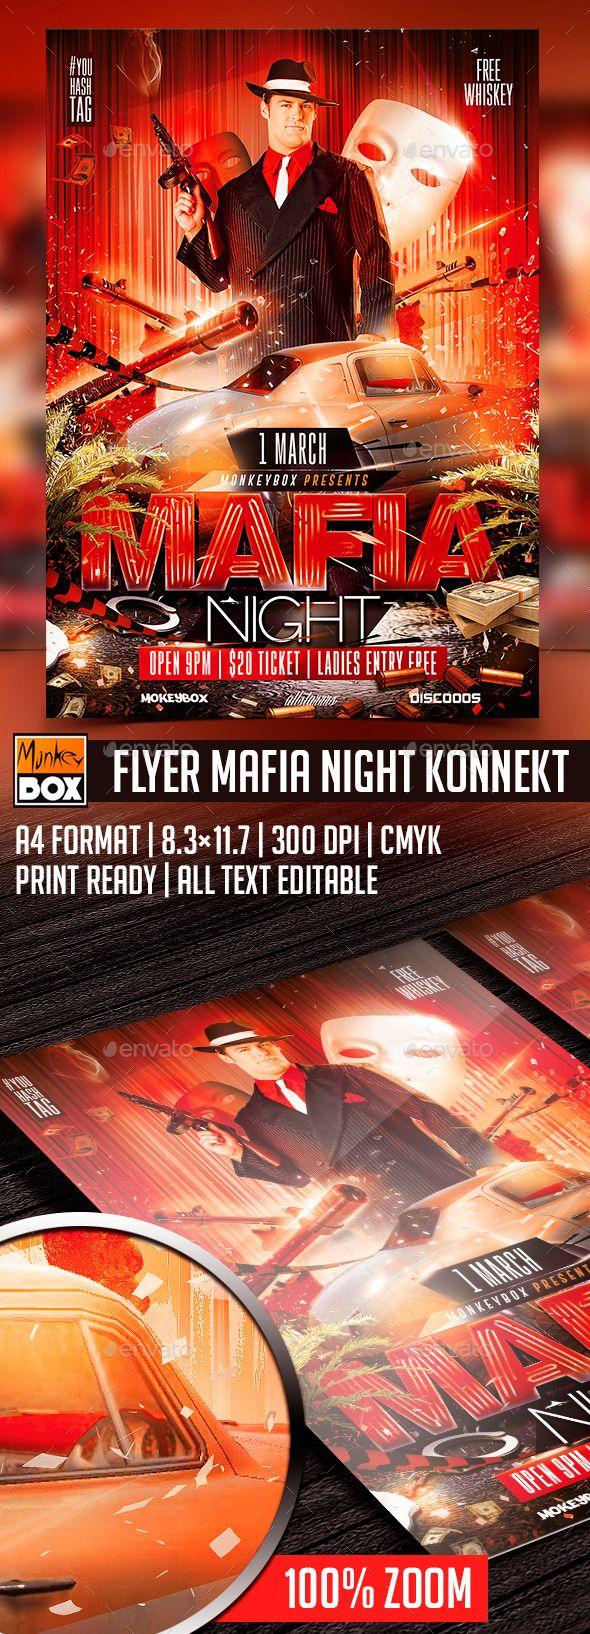 Flyer Mafia Night Konnekt Flyer, Mafia, Night